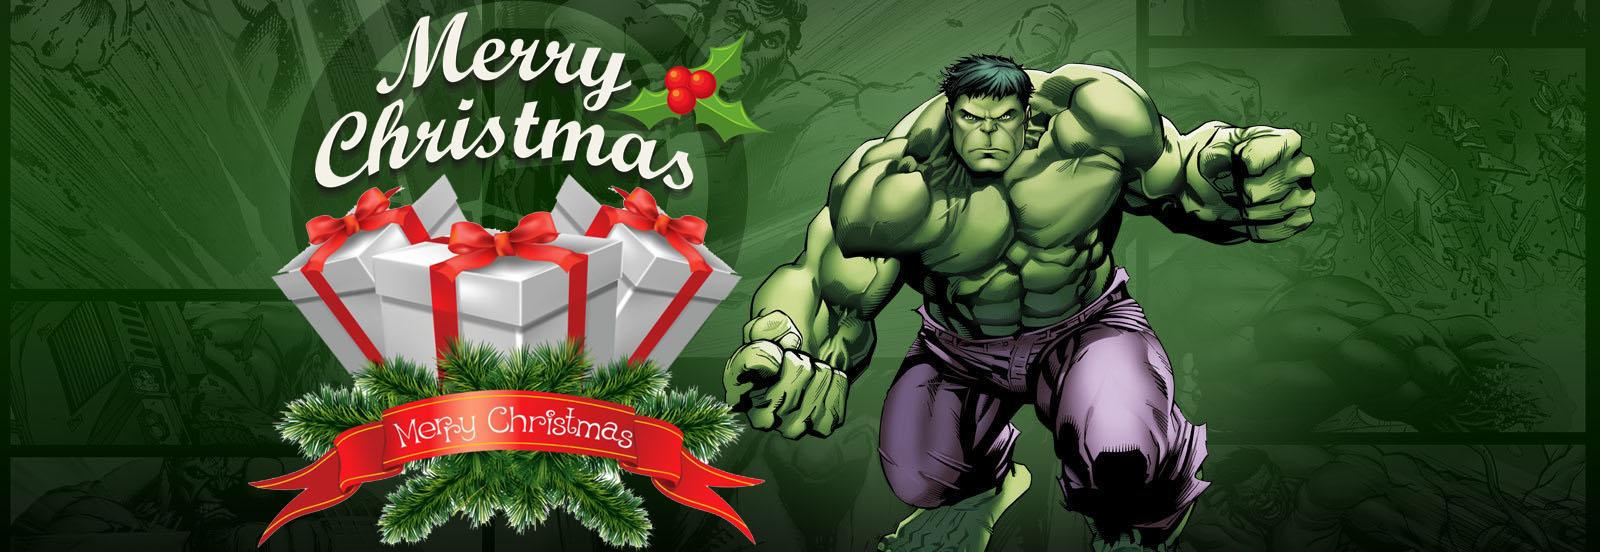 happy merry christmas greetings wishes super hero hulk kids hd wallpaper